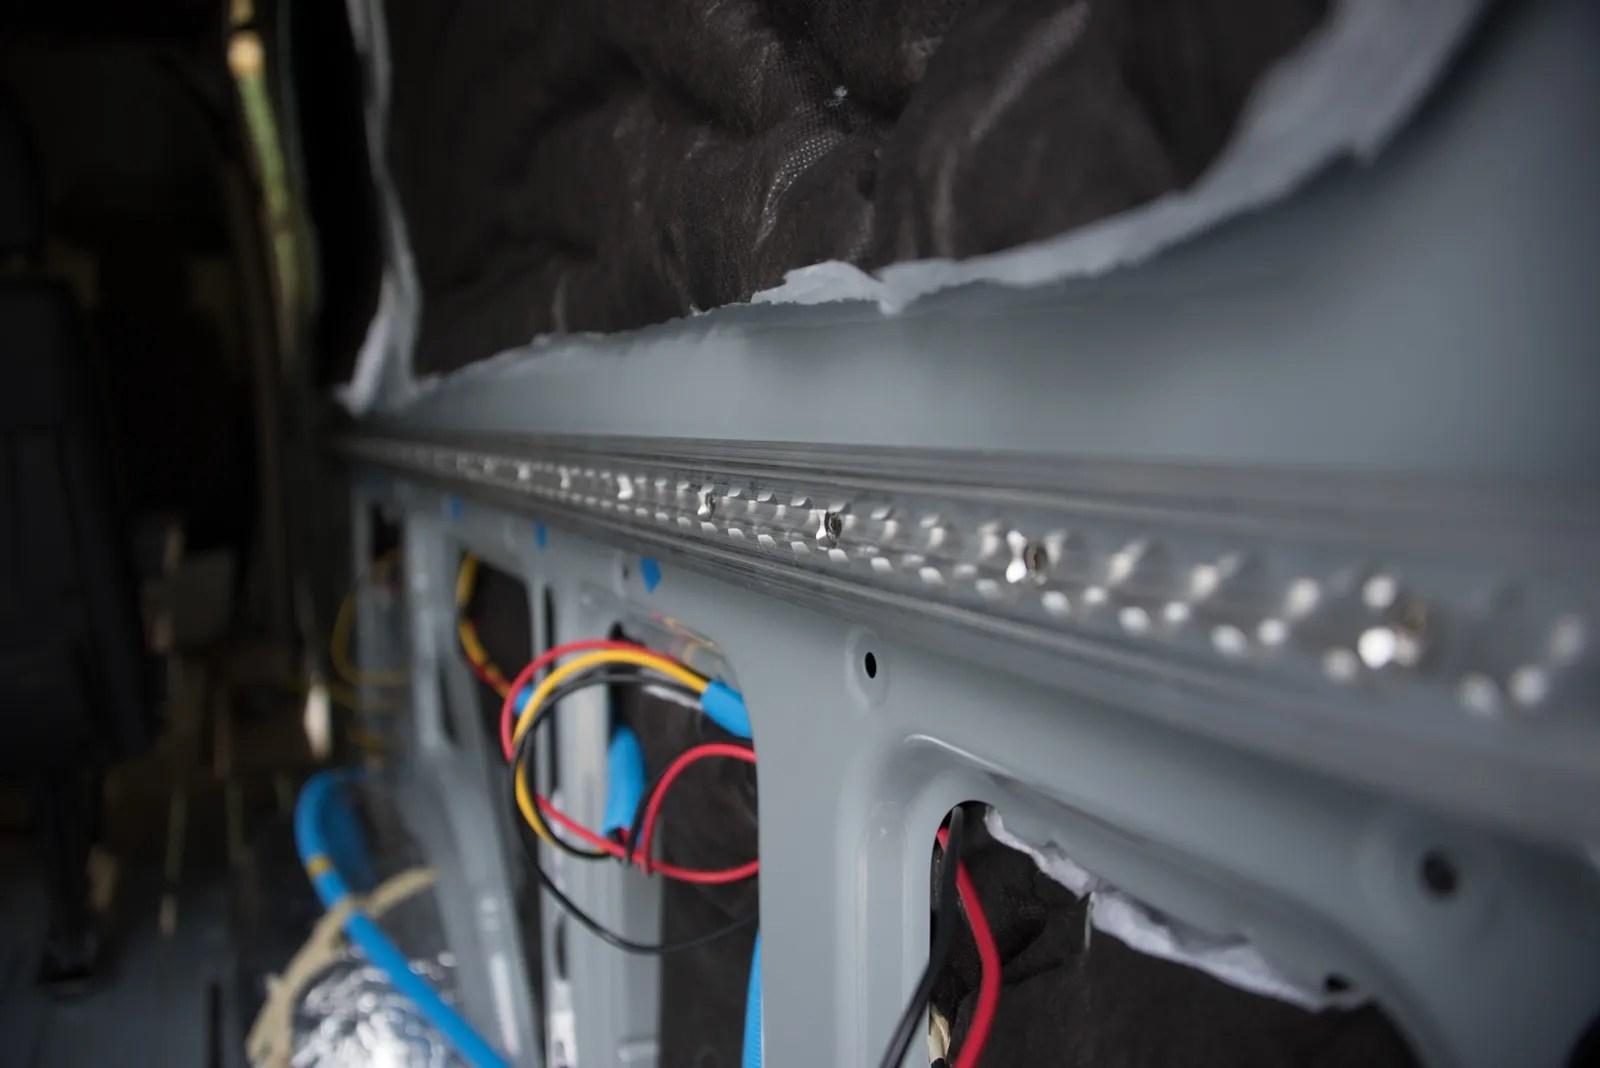 Aluminum l-track makes a reconfigurable tie-down system